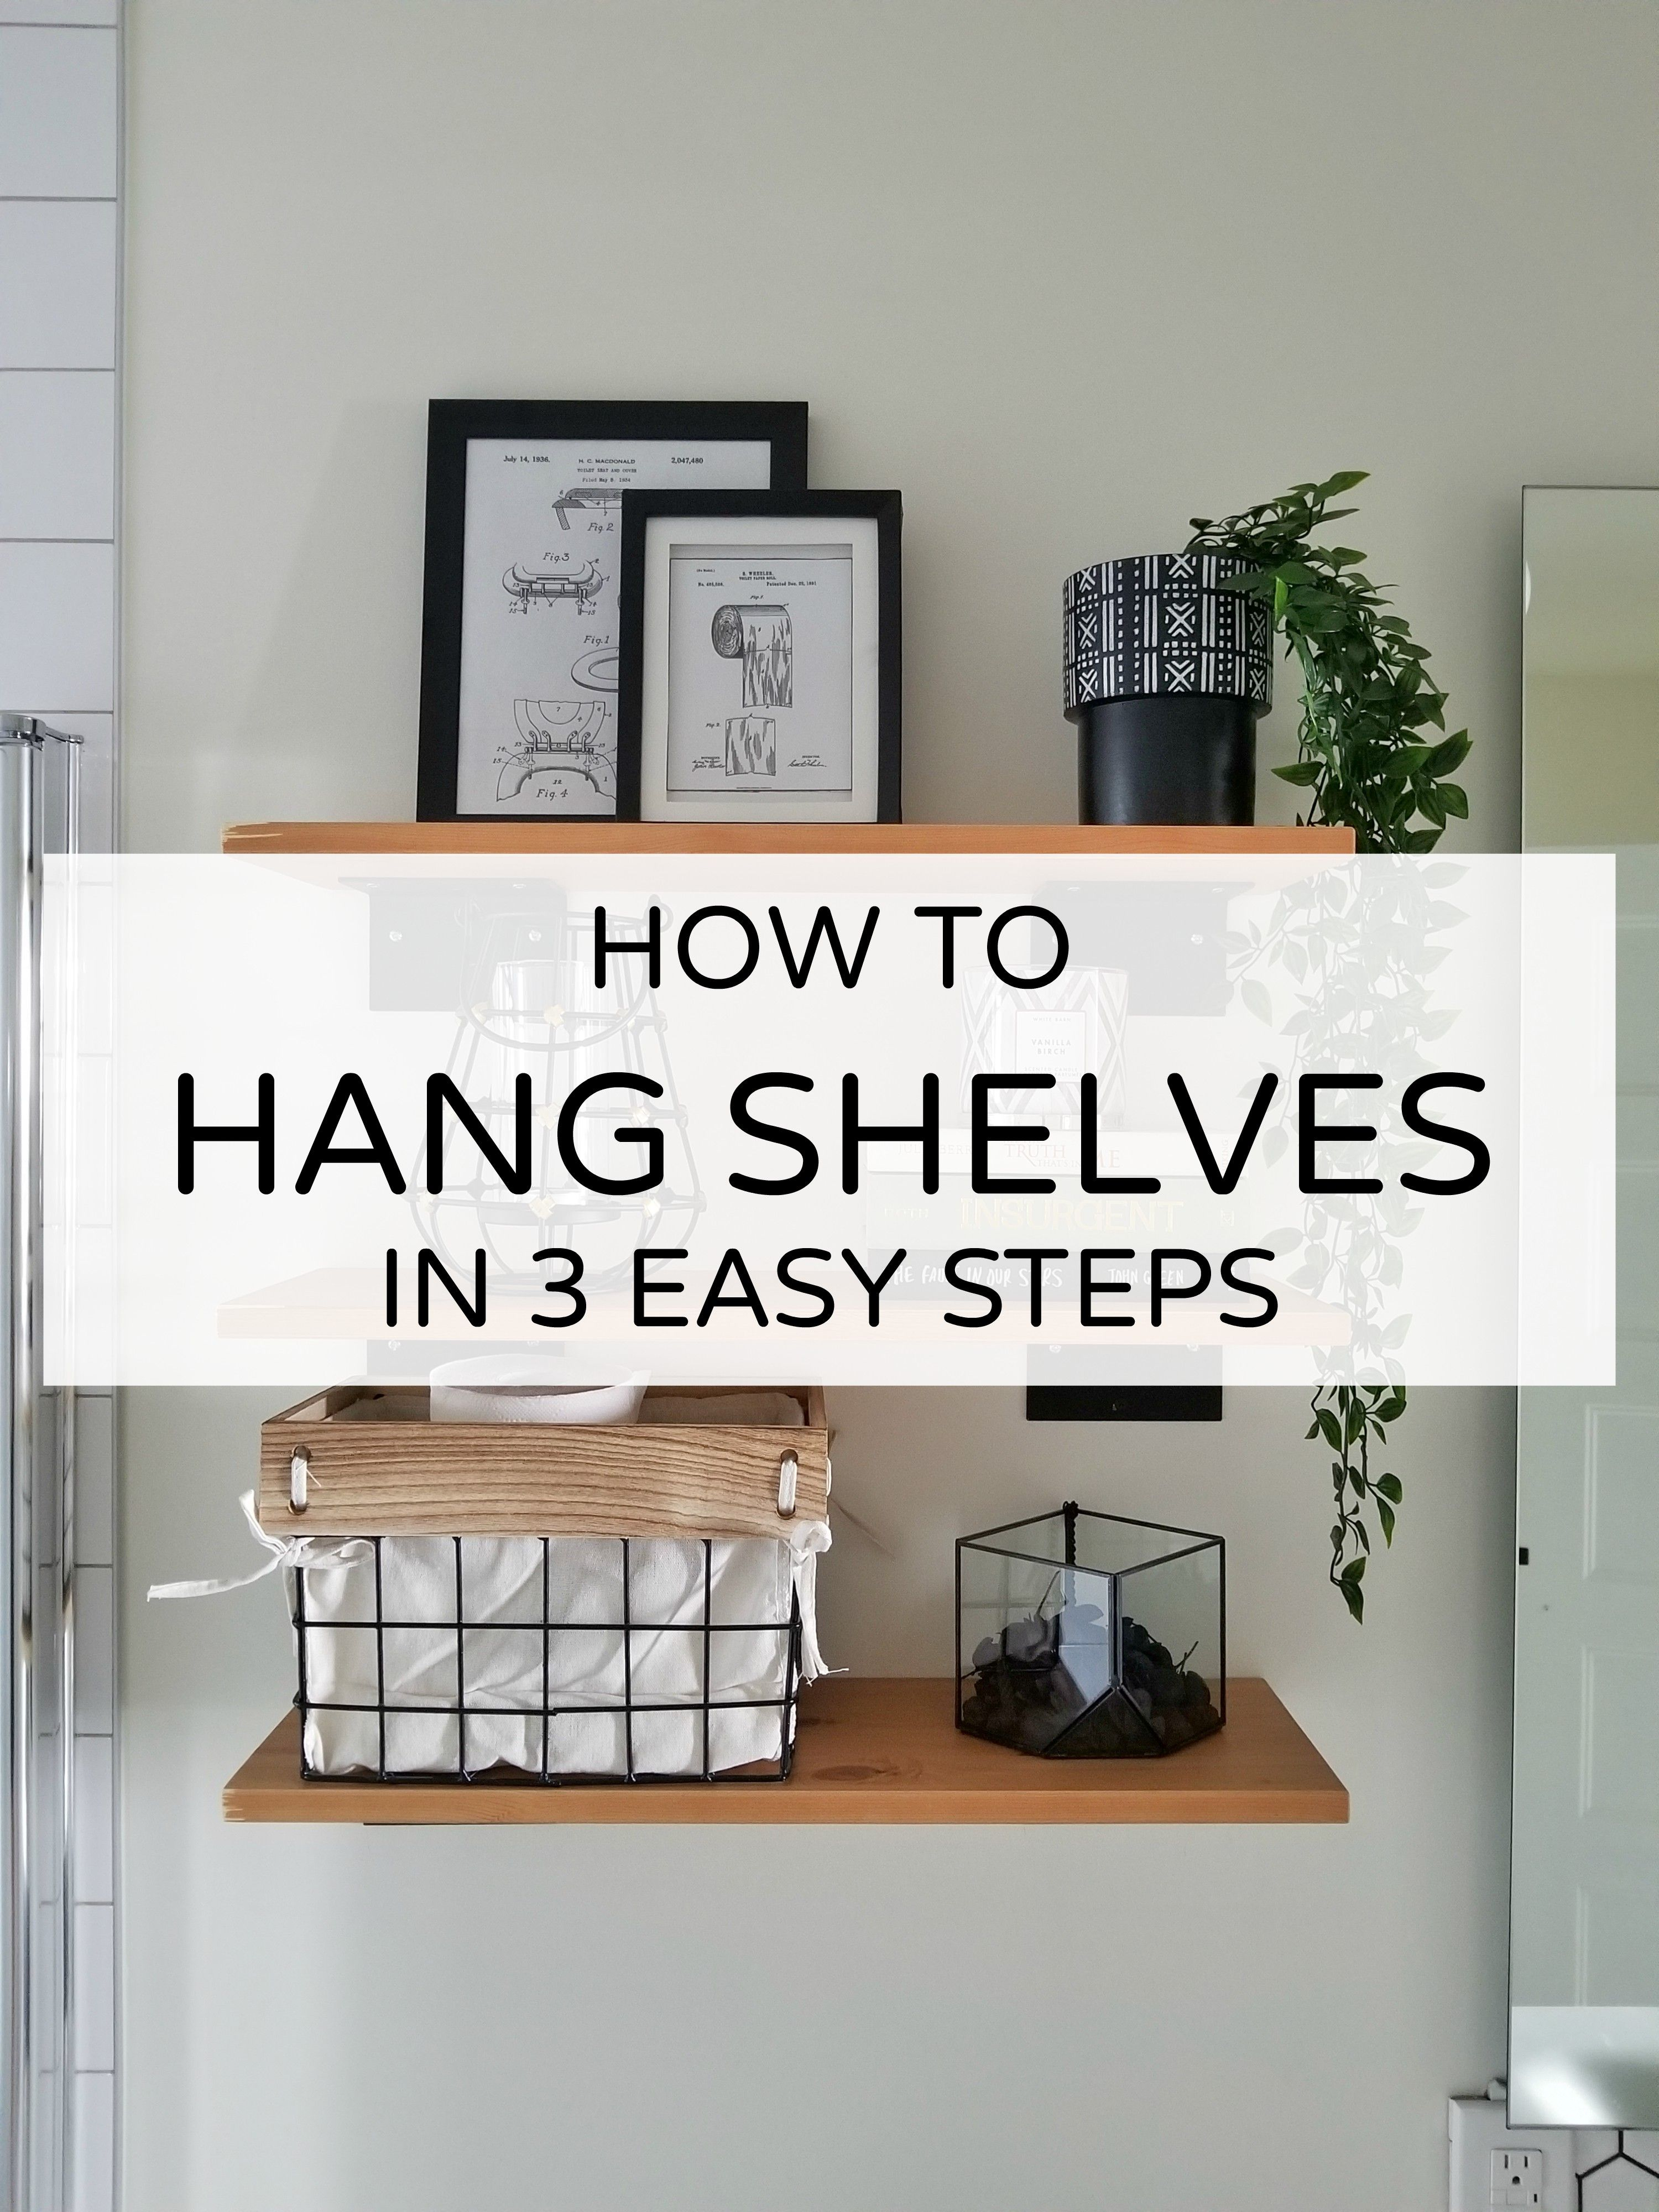 Ikea Wall Shelves How To Hang Shelves In 3 Easy Steps Diy Ikea